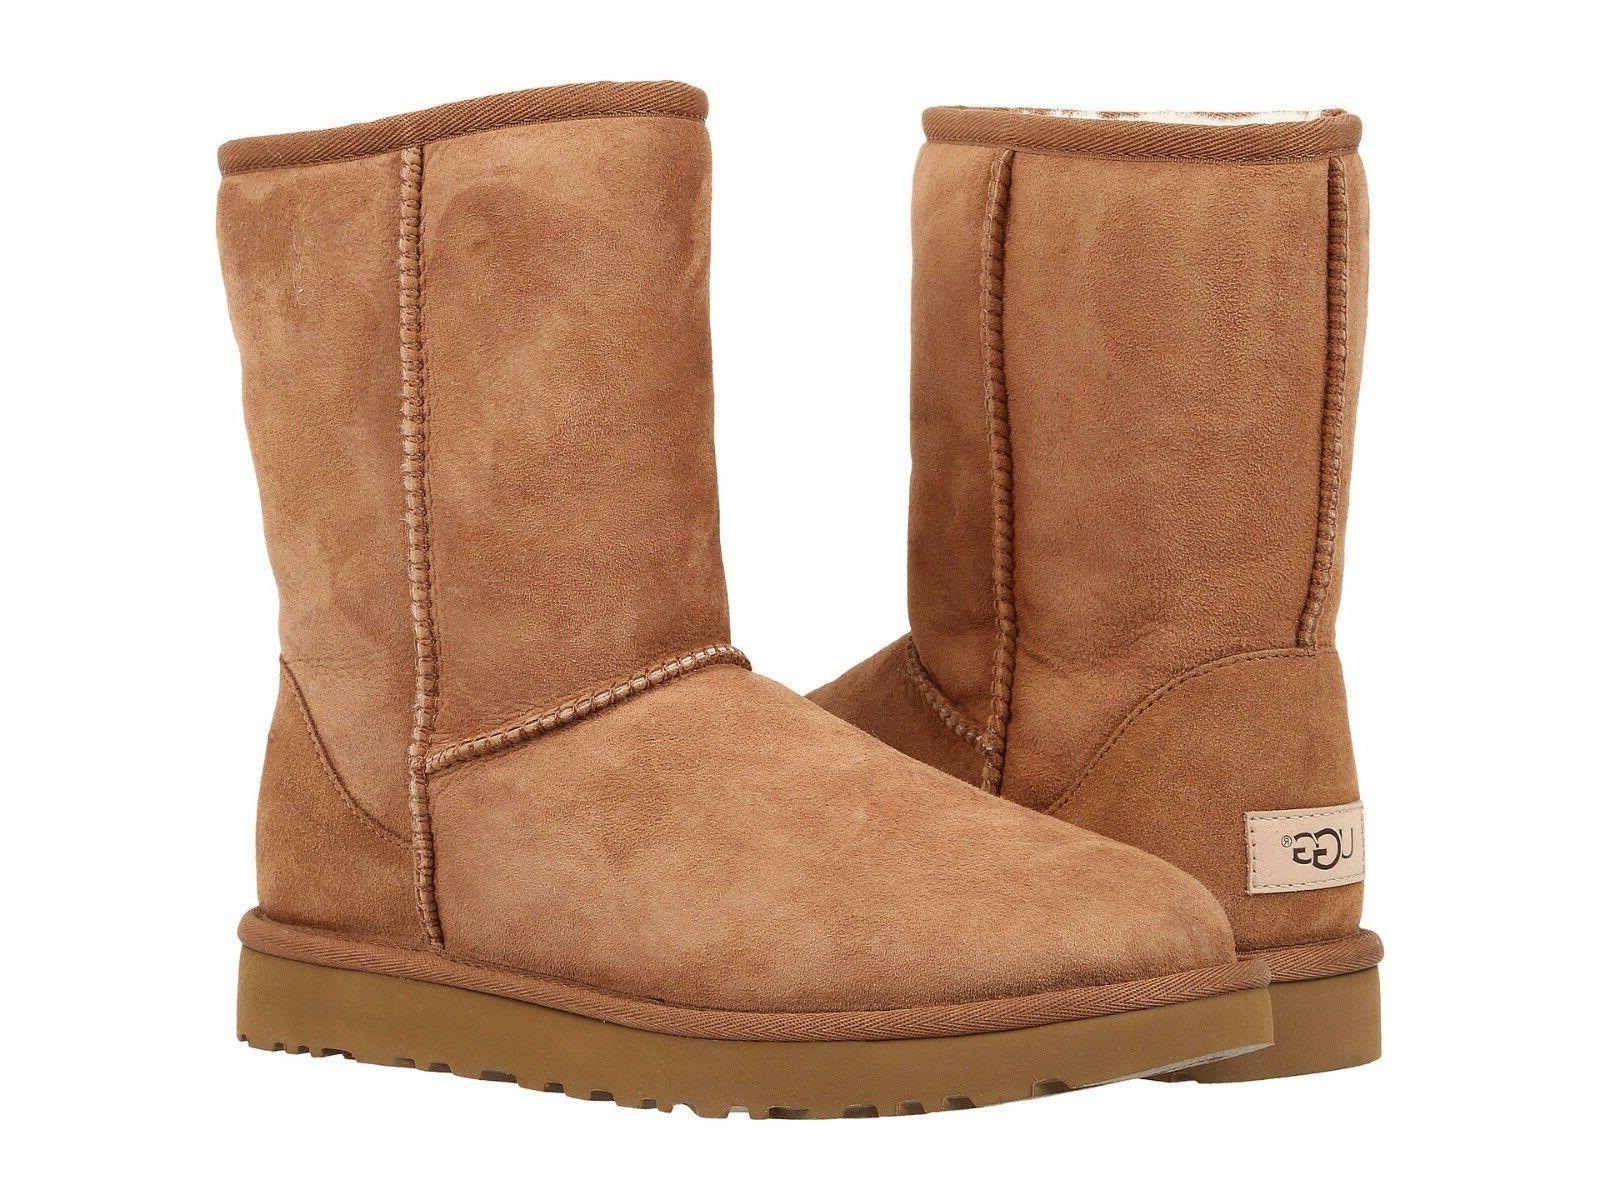 Women's Shoes UGG Classic Short II Boots 1016223 Chestnut 5